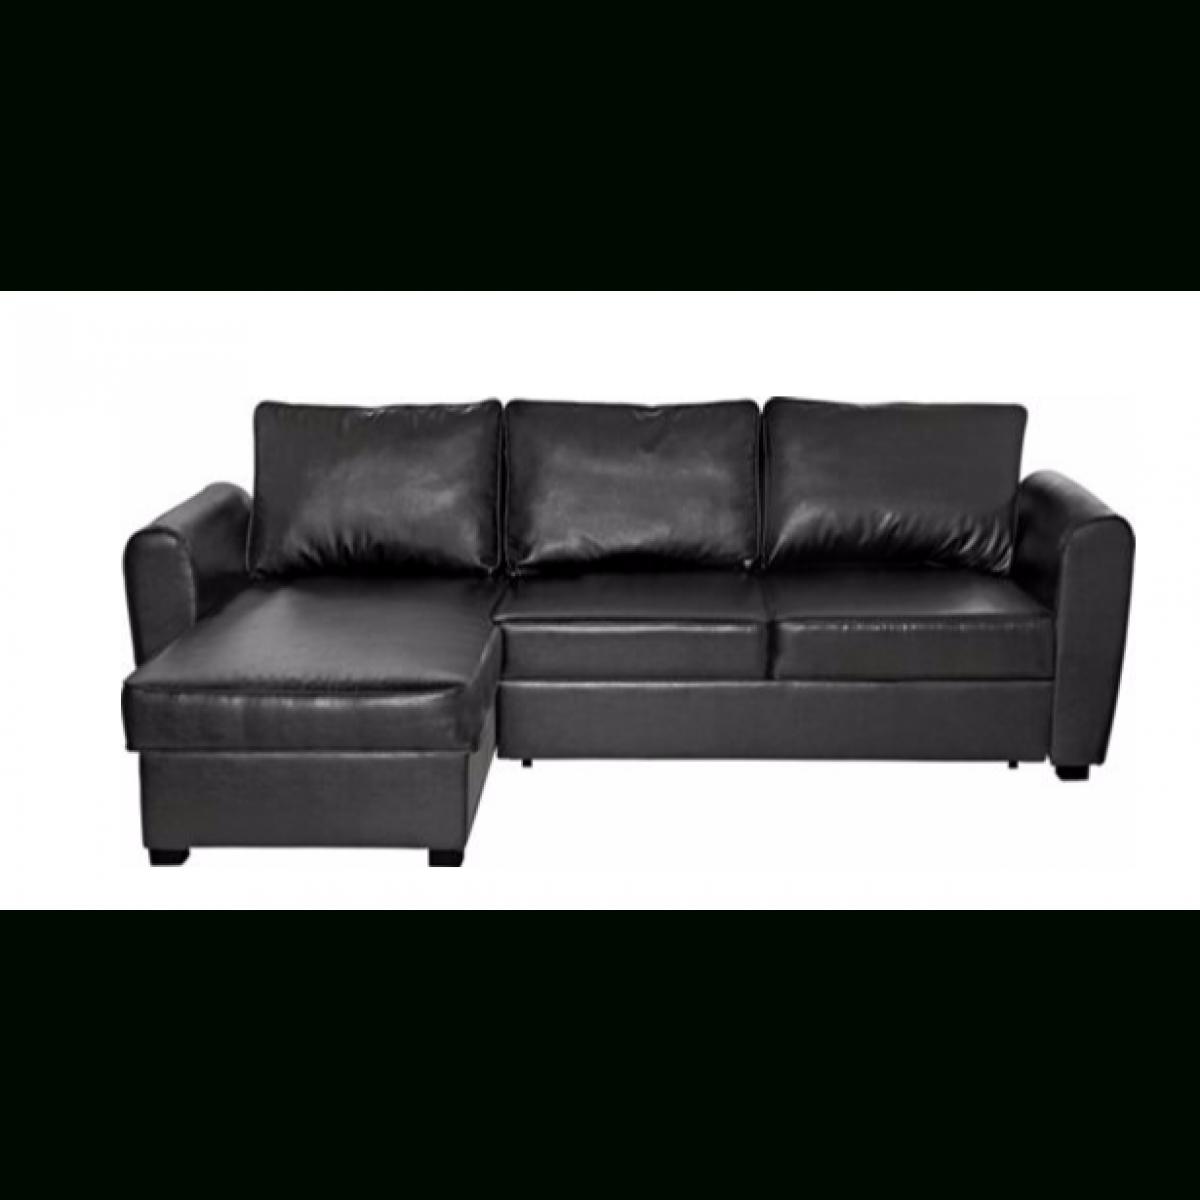 New Siena Fabric Corner Sofa Bed With Storage - Charcoal throughout Fabric Corner Sofa Bed (Image 24 of 30)